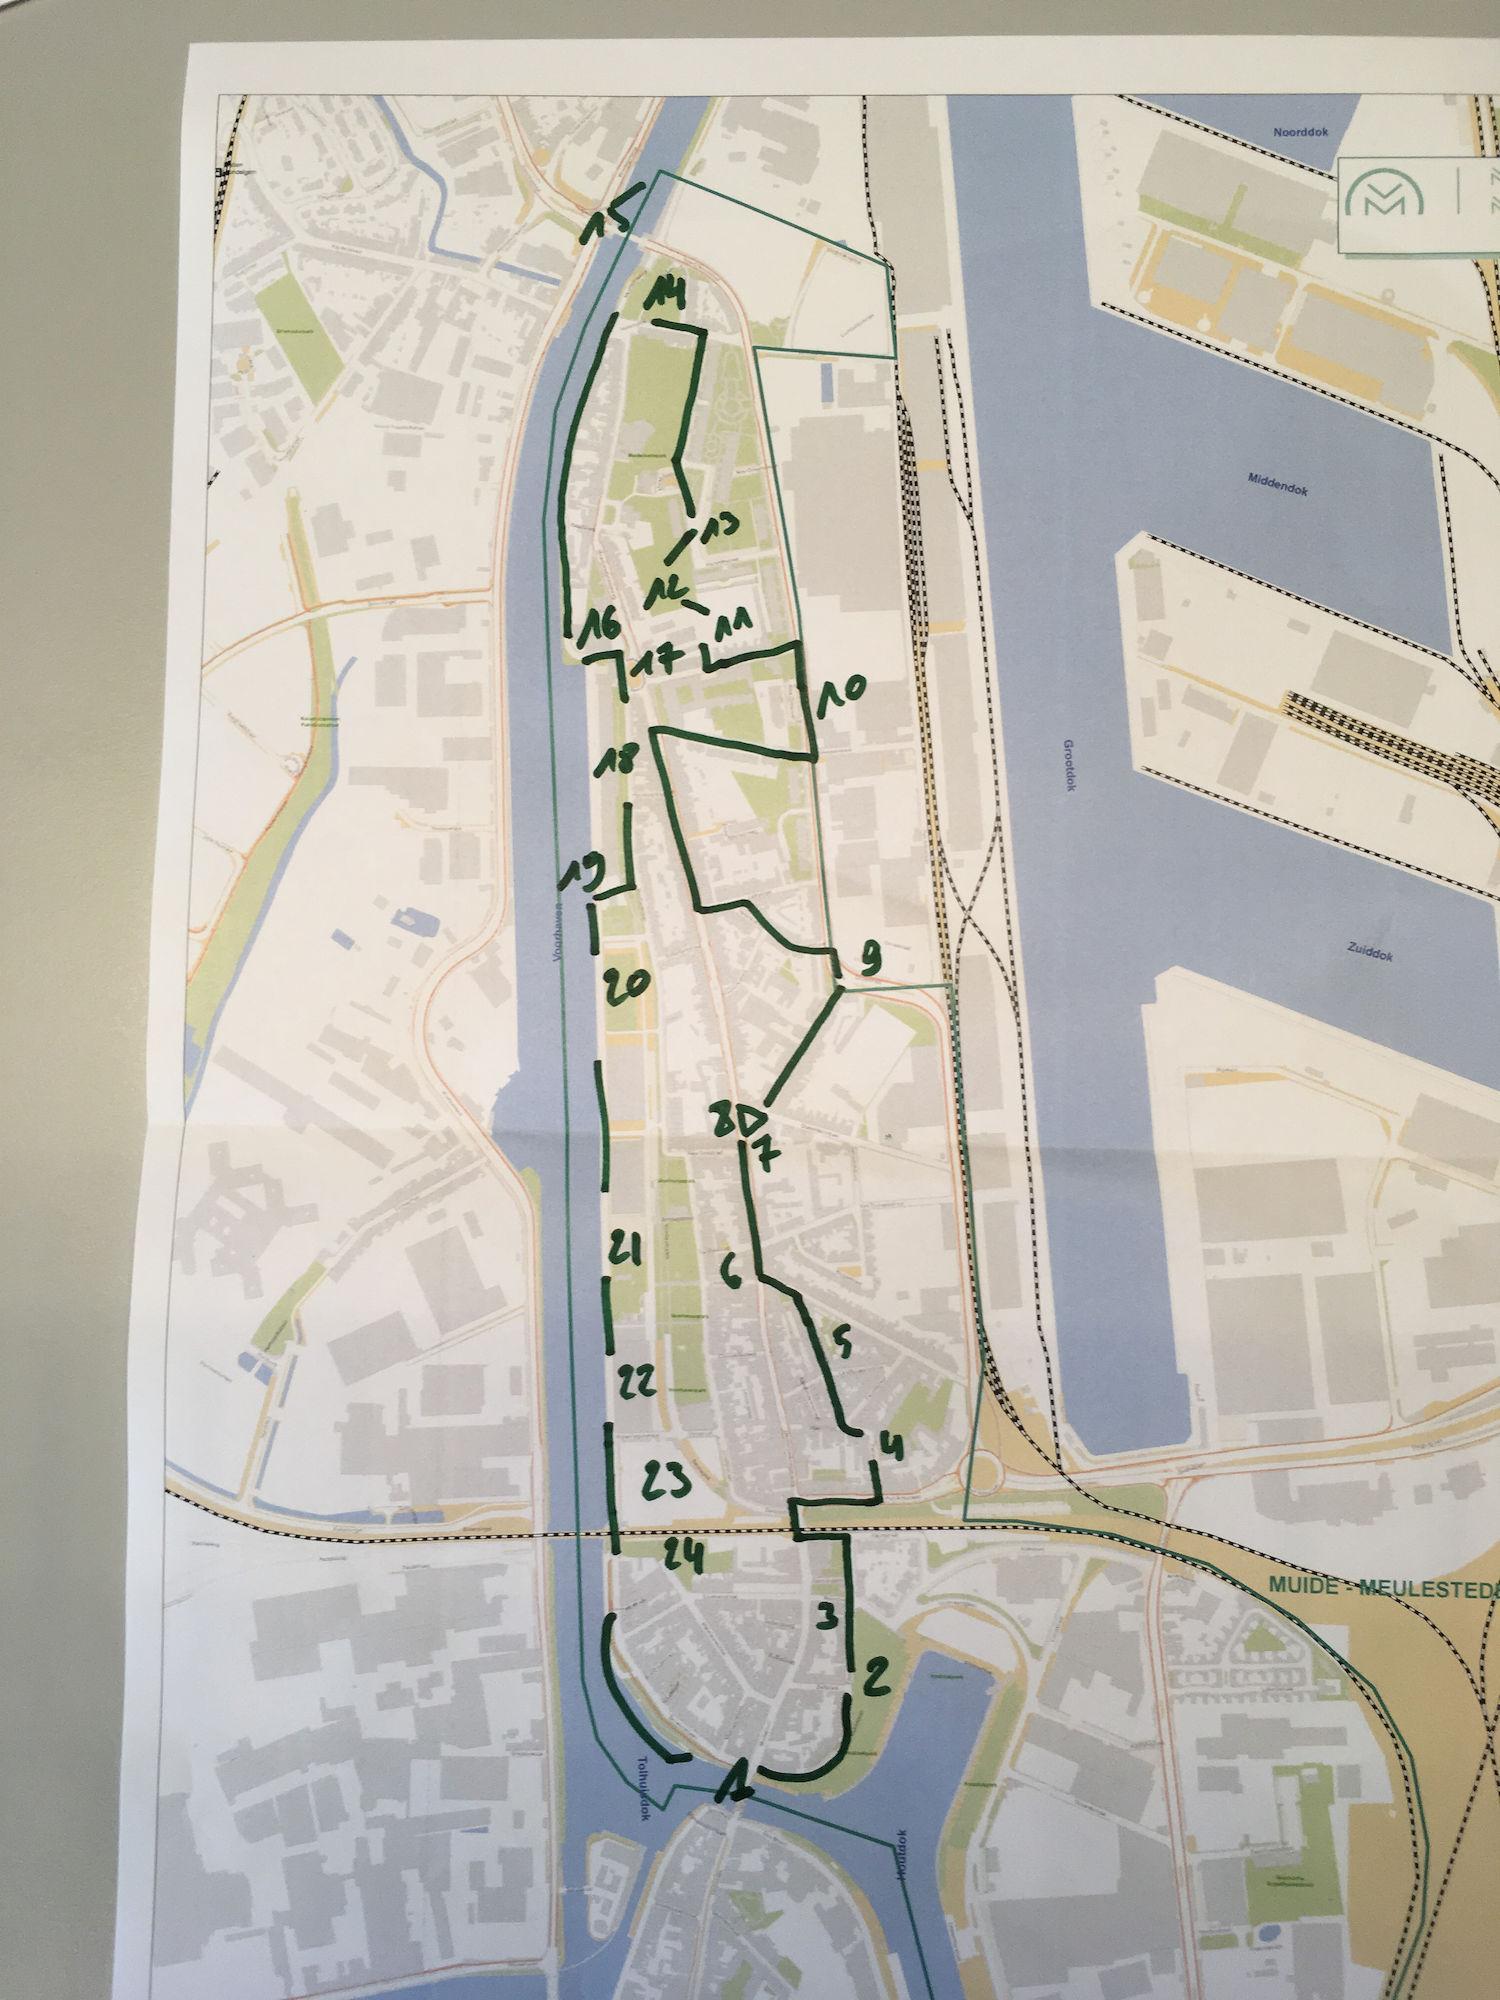 Wijk 10 Muide Meulestede 2019-07-01 prospectie Wannes_stadsvernieuwing